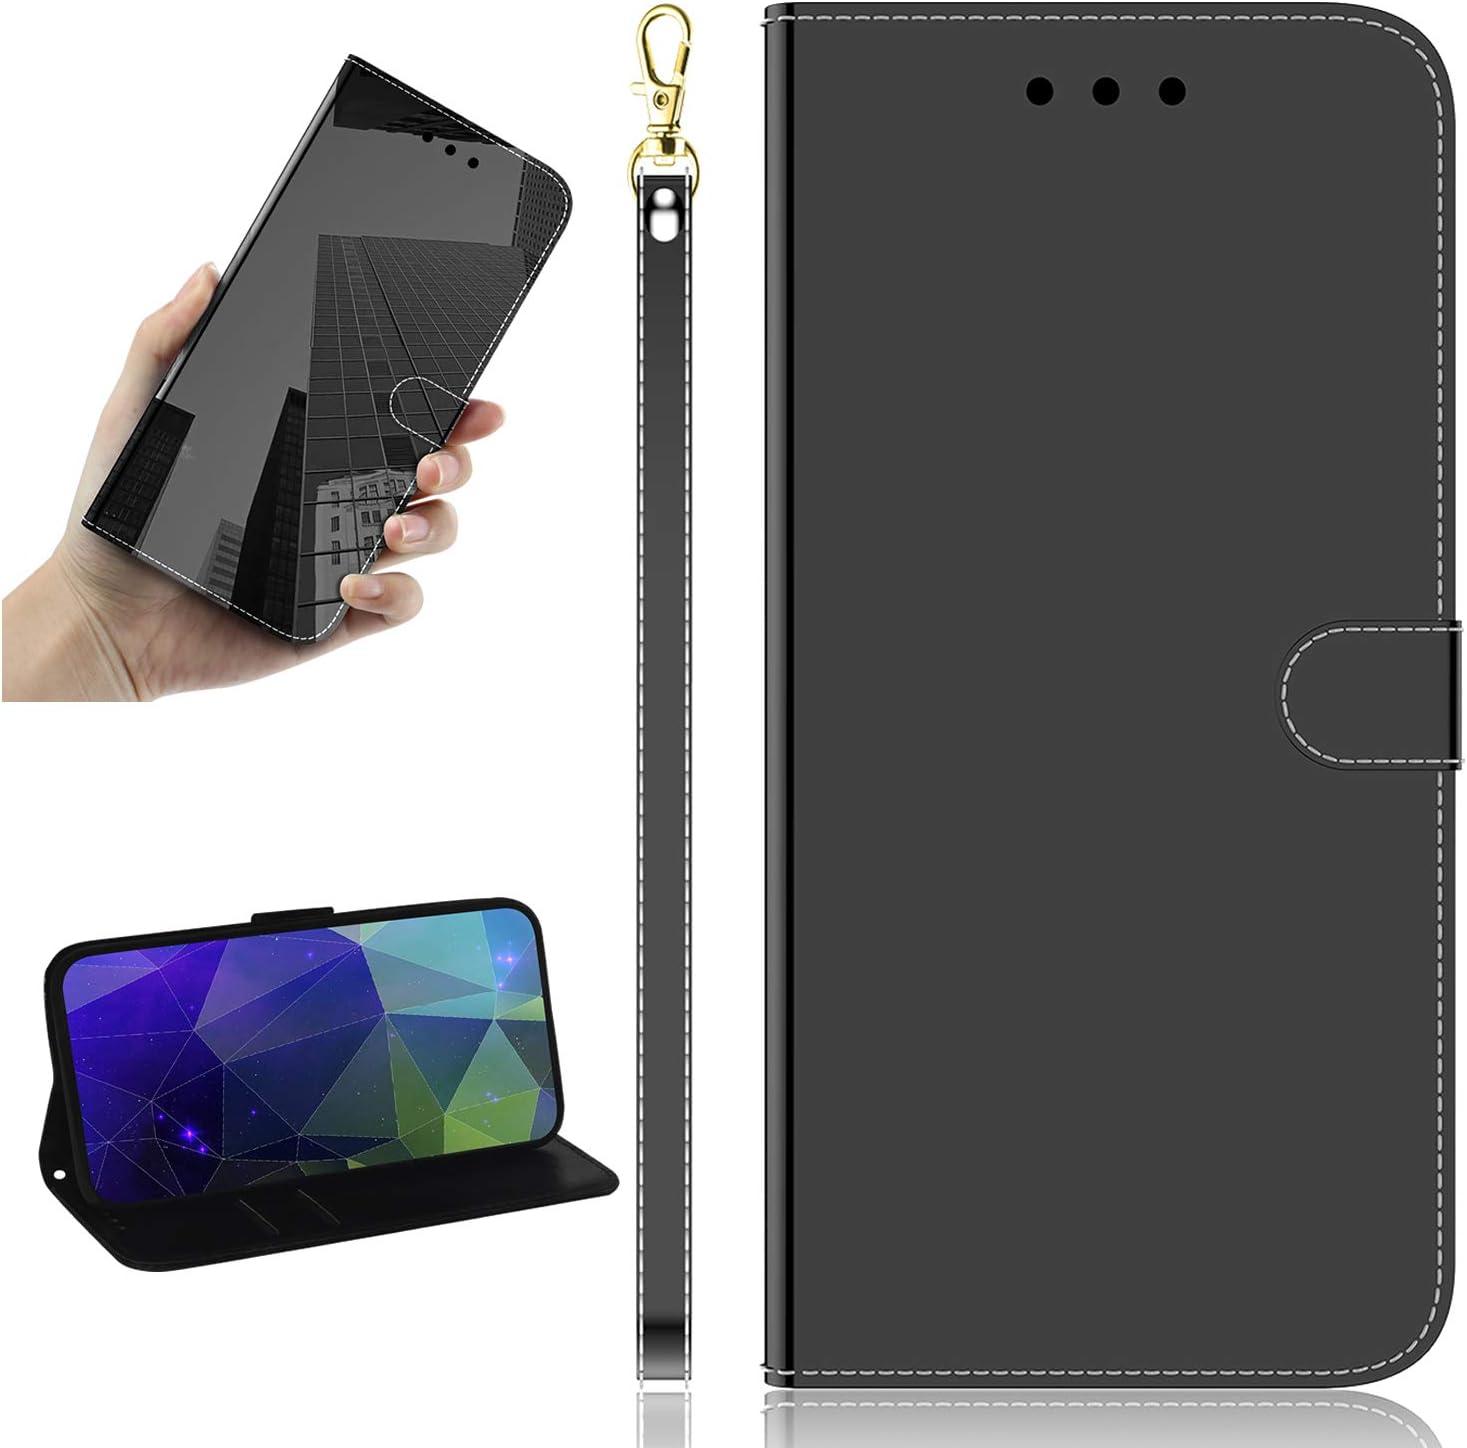 Miagon Mirror Effect depot Leather Case for Huawei Slim New item Pro Mak P30 PU